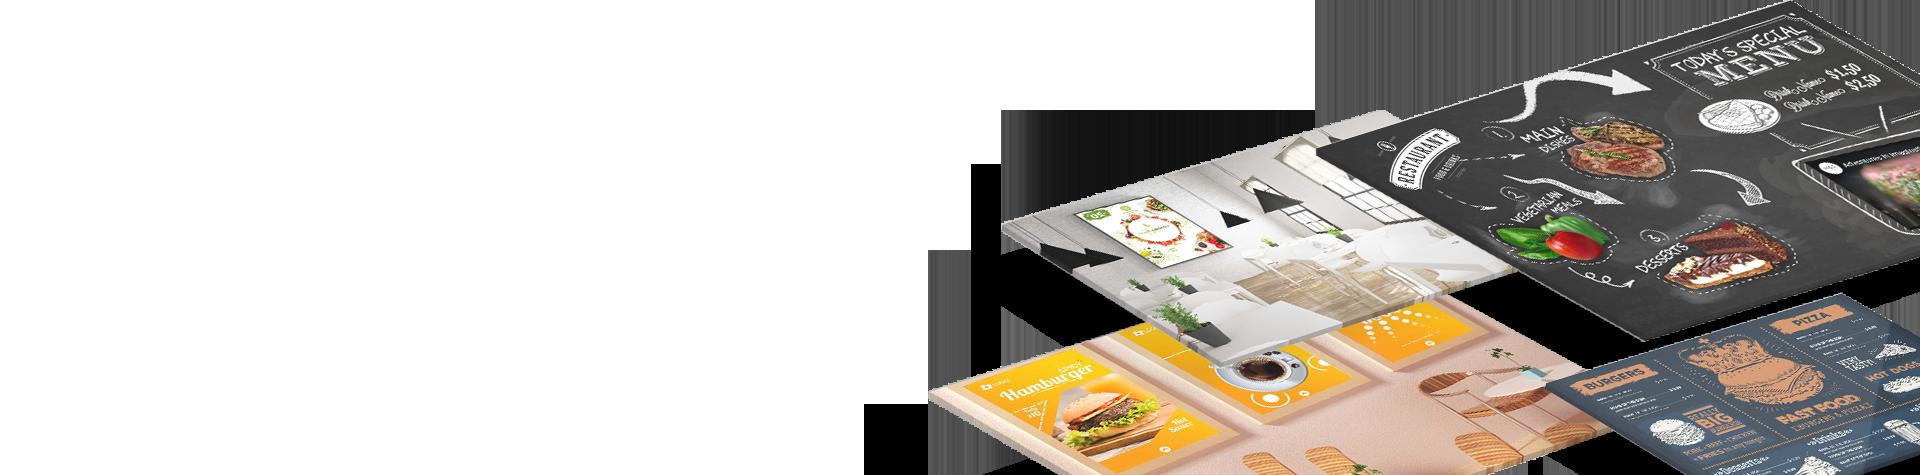 Restaurant Café Bar digital signage solutions